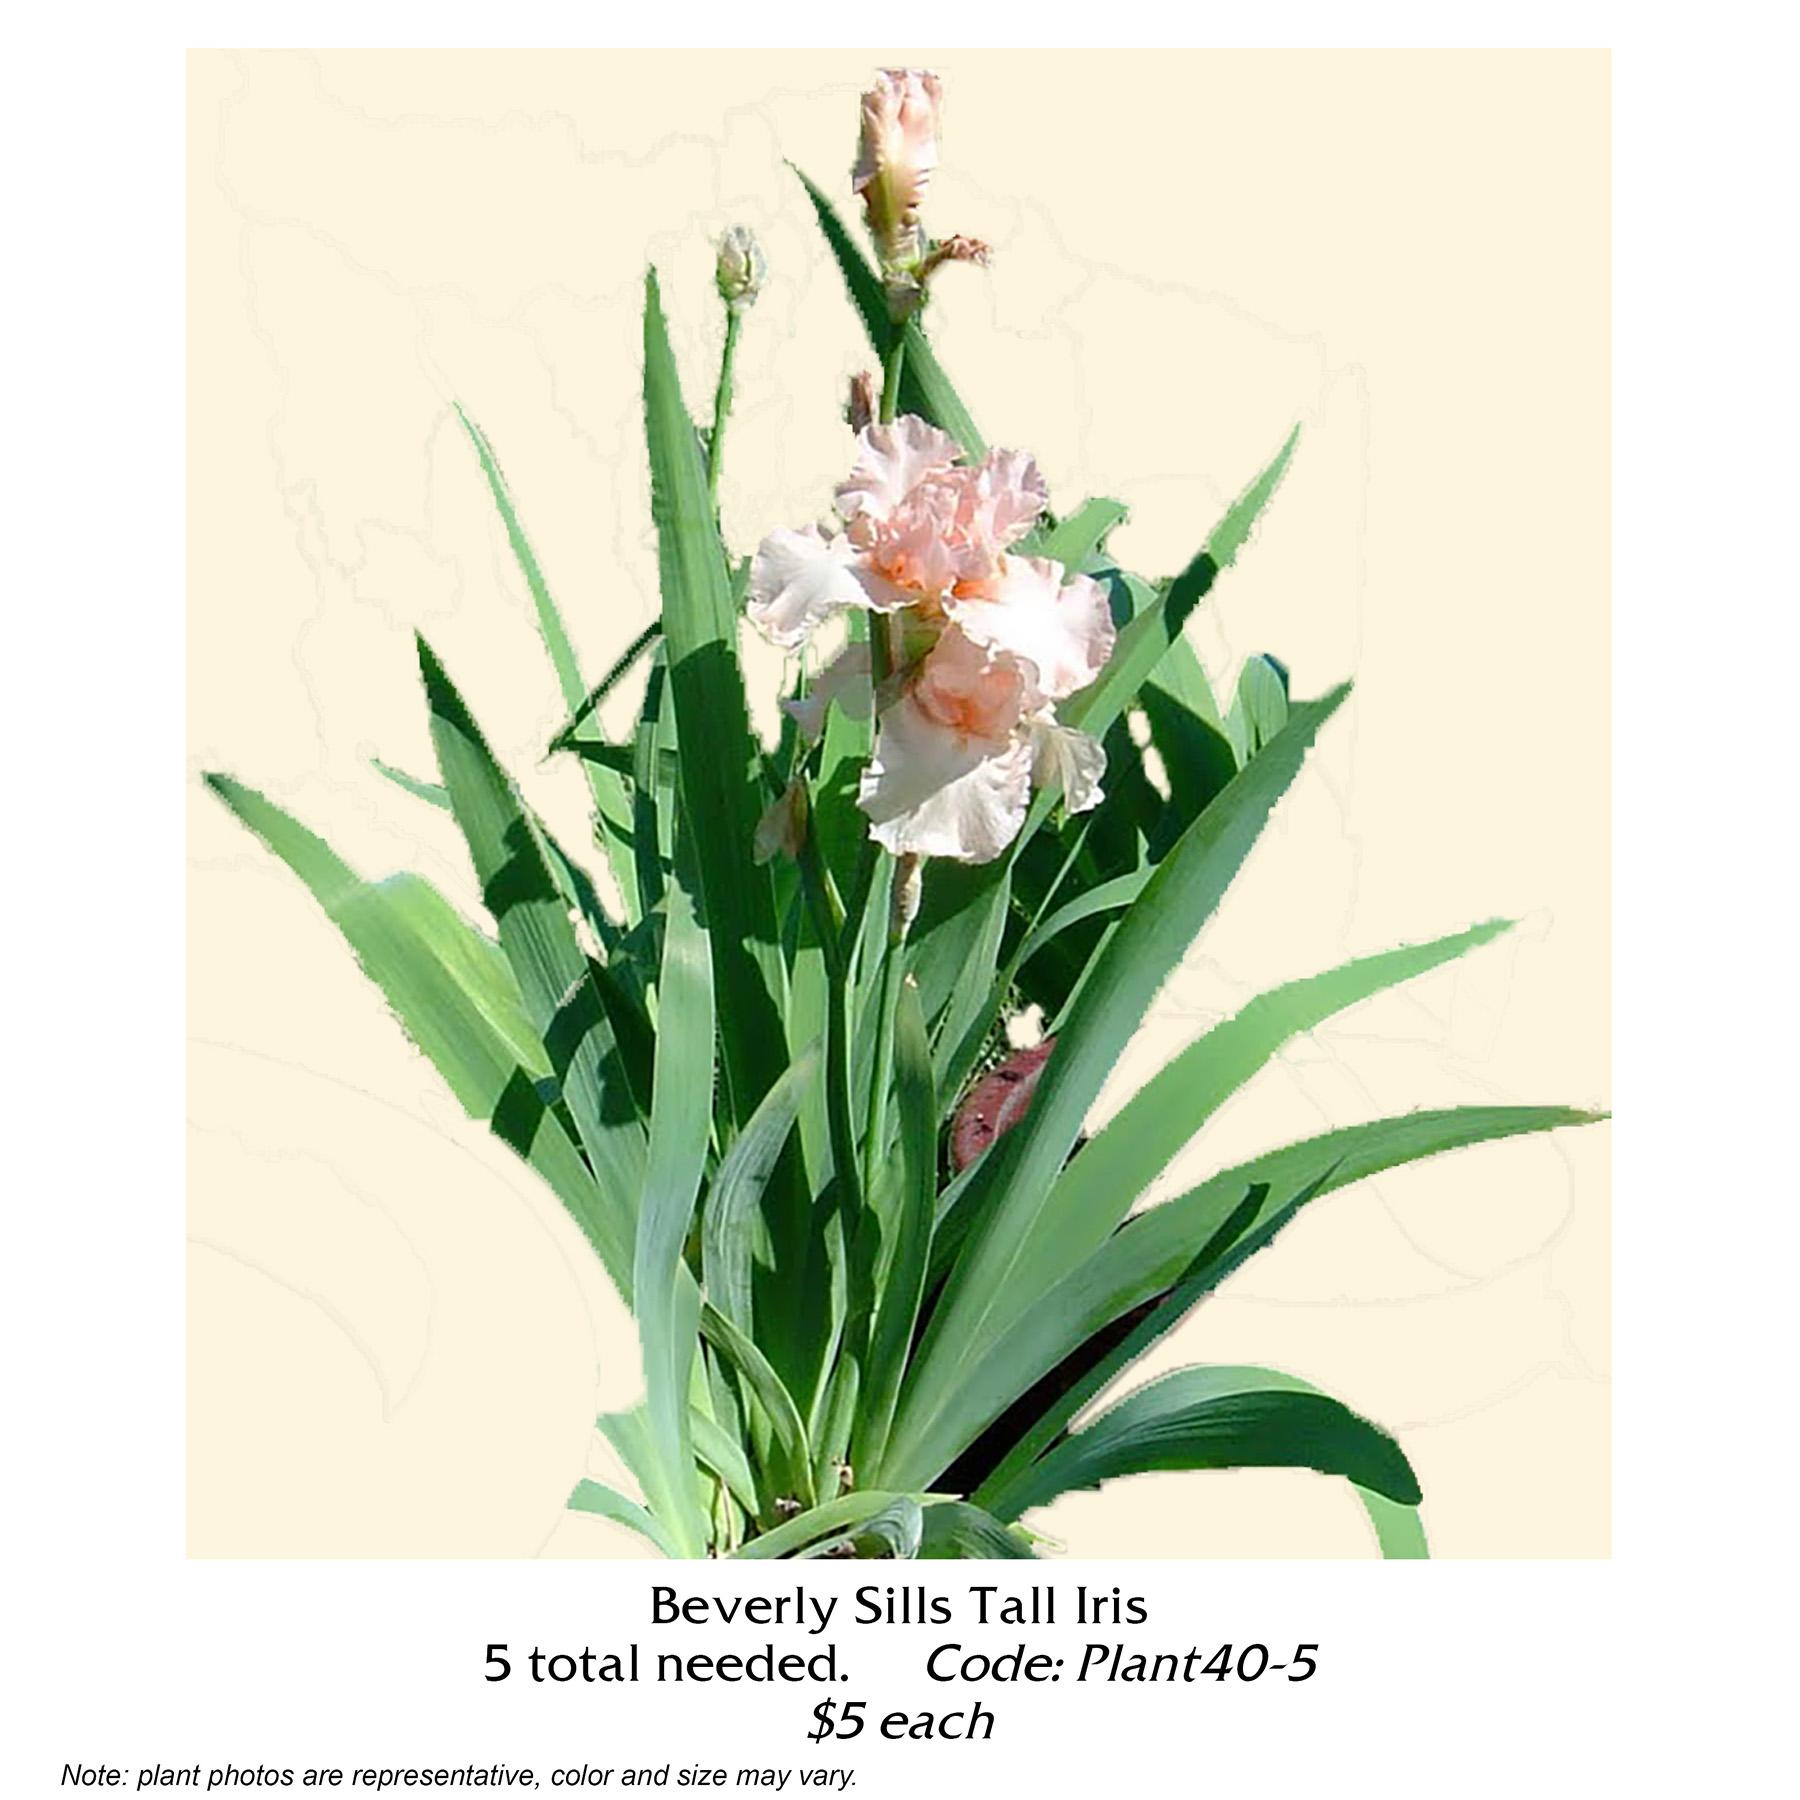 Beverly Sills Tall Iris.jpg